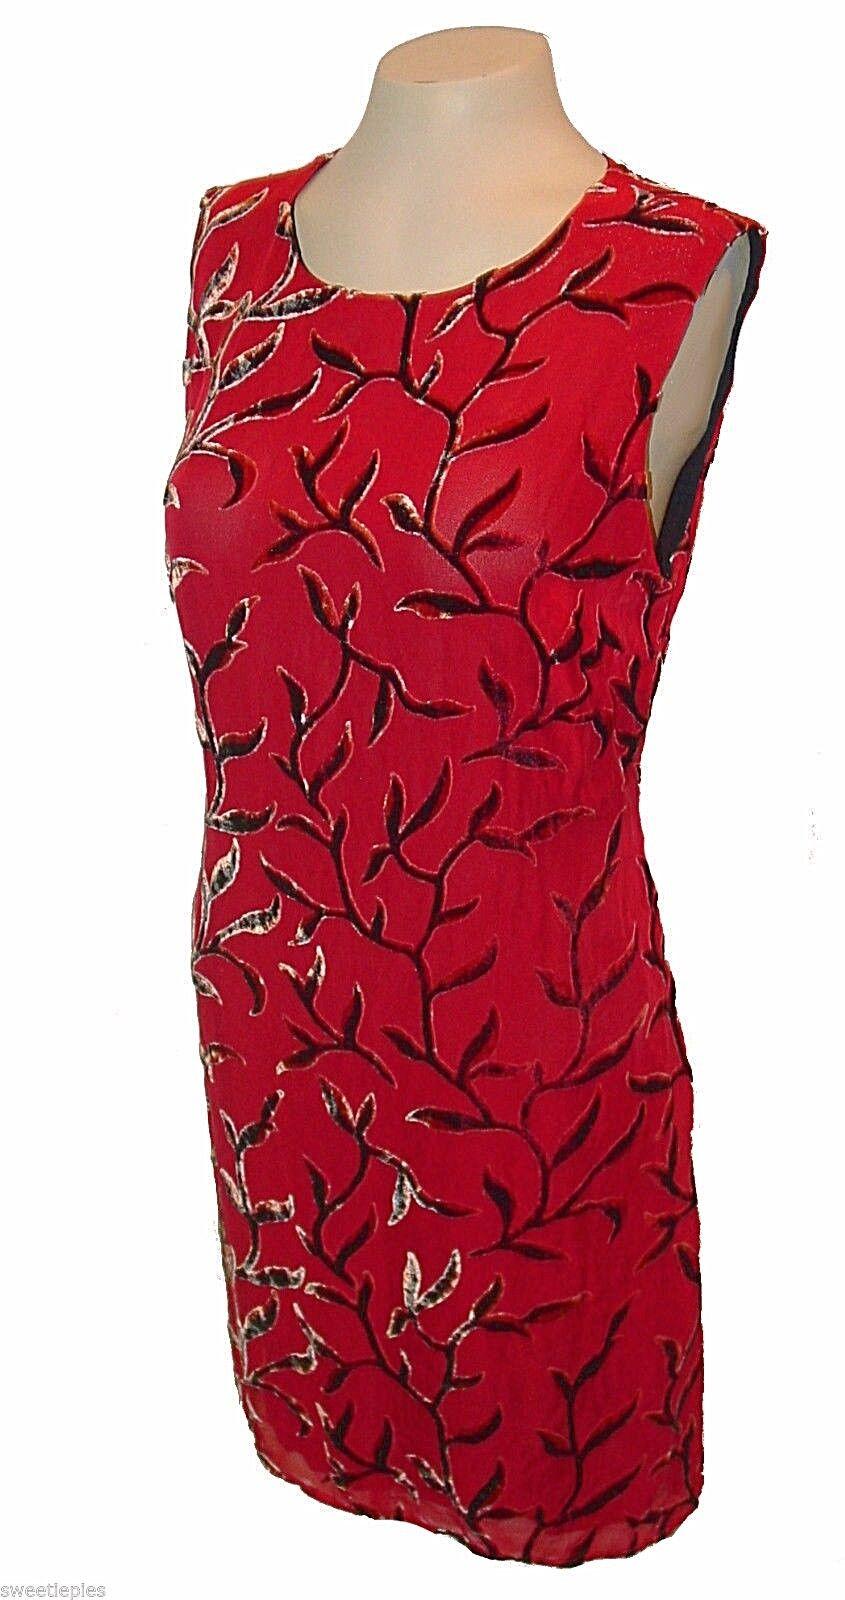 New Dress, Dress, Dress, Tessuto, Shift Sheer w Velour-shiny-pattern Lined Silk-Blend Red, L 8b975a